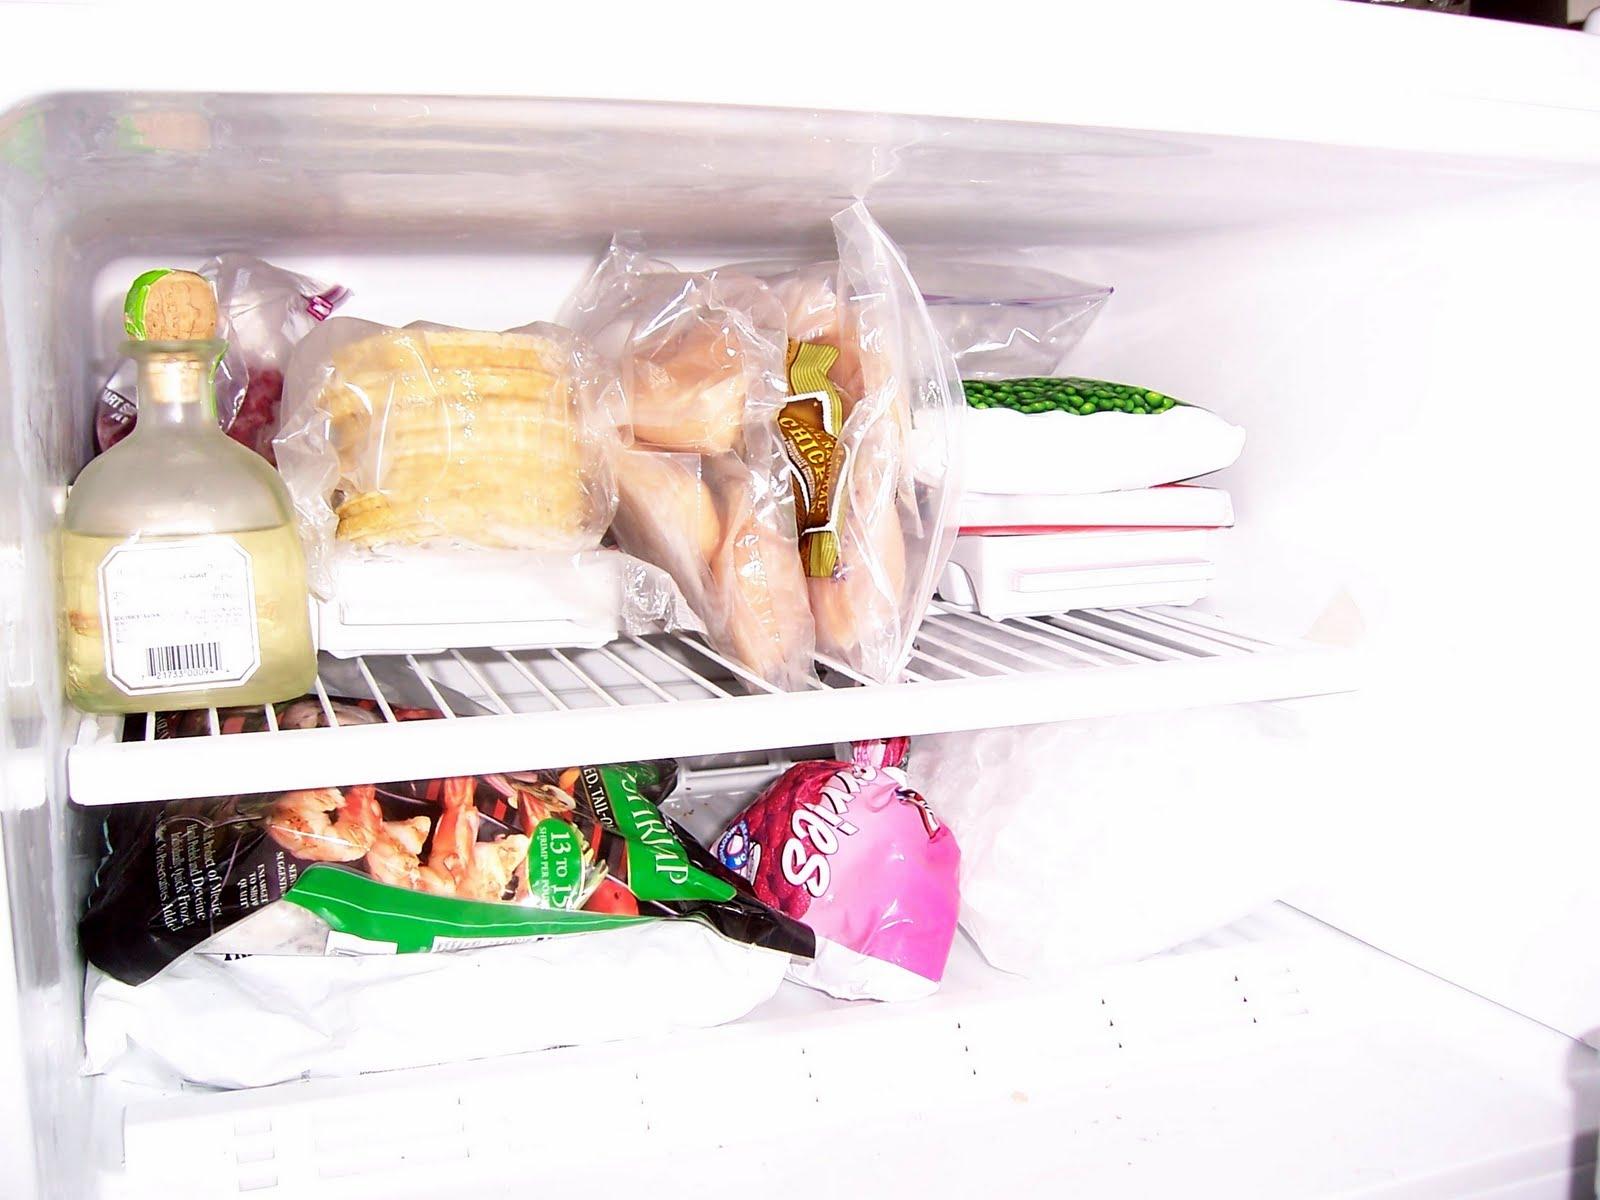 [My+Freezer.JPG]